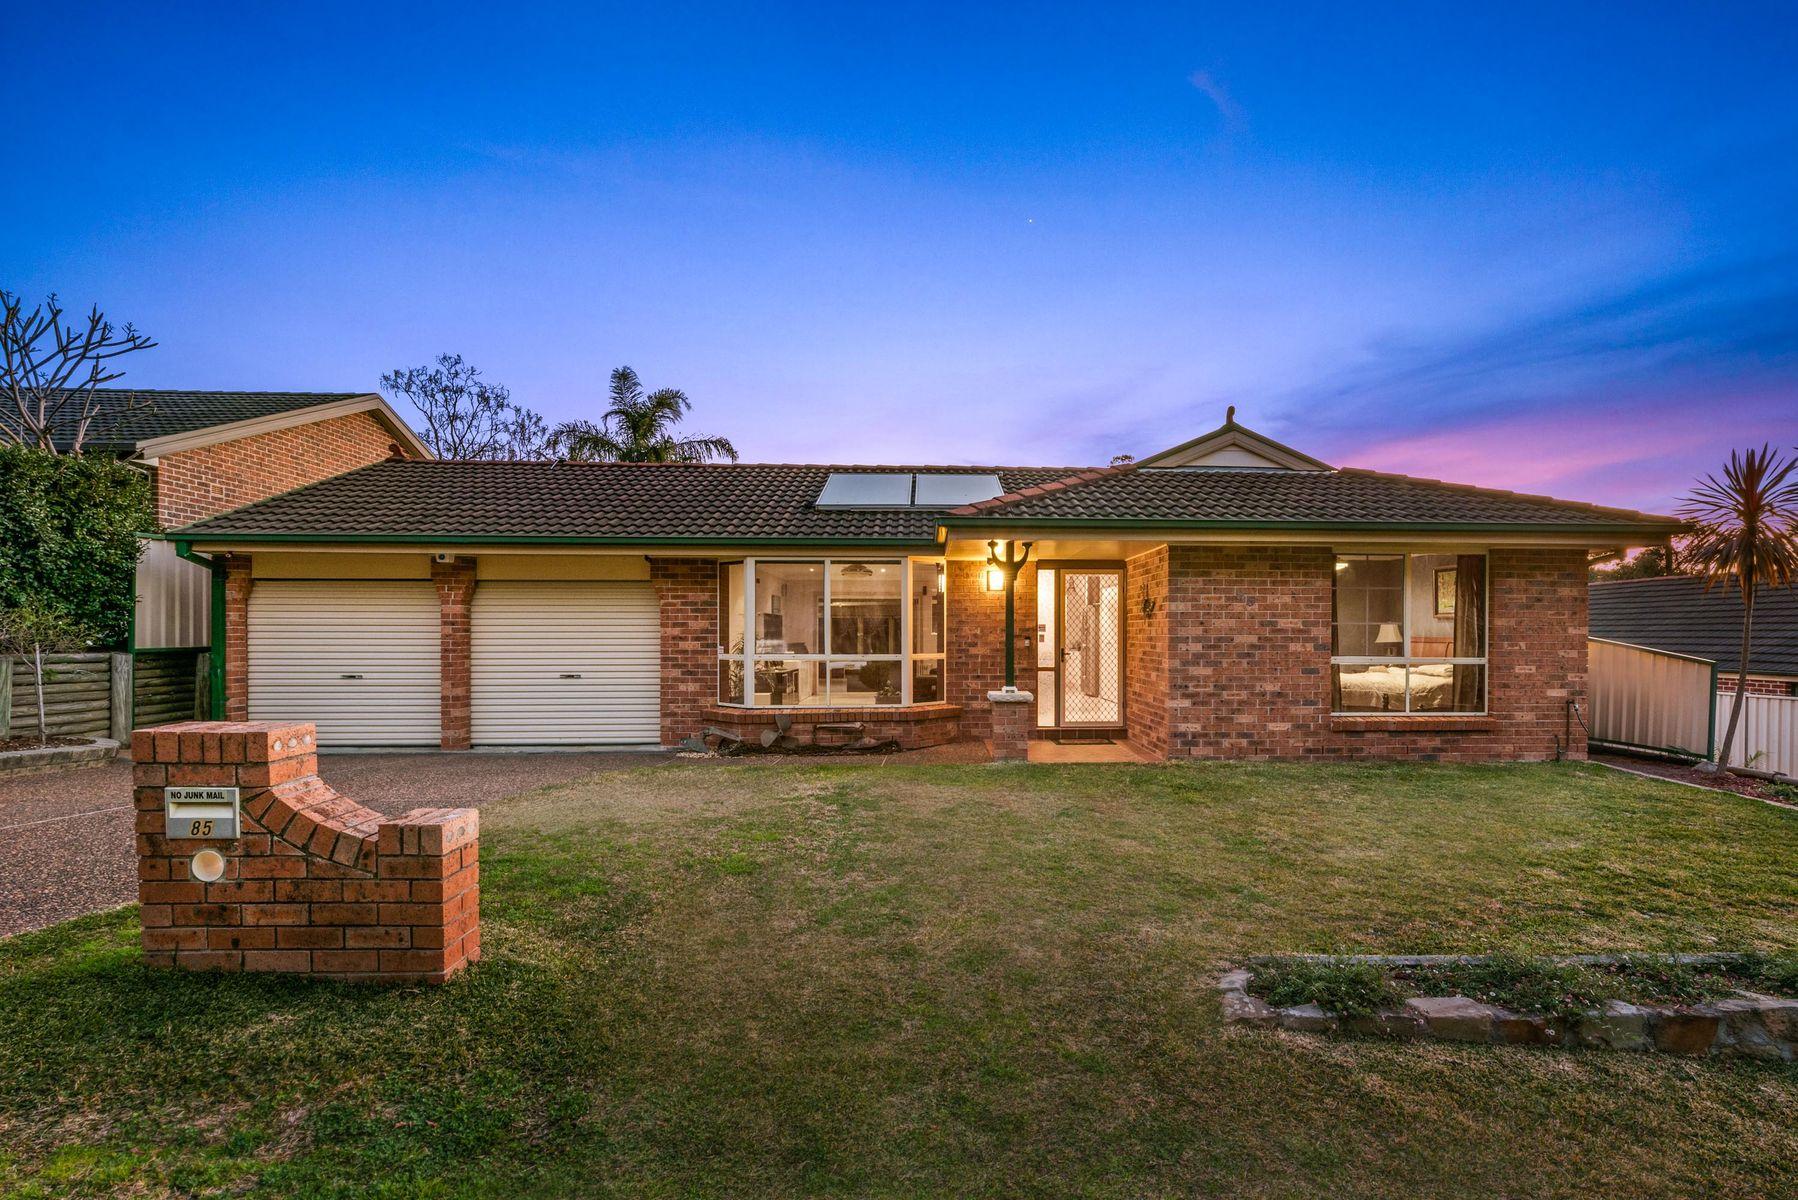 85 Burton Rd, Eleebana NSW 2282, Australia , House for Sale